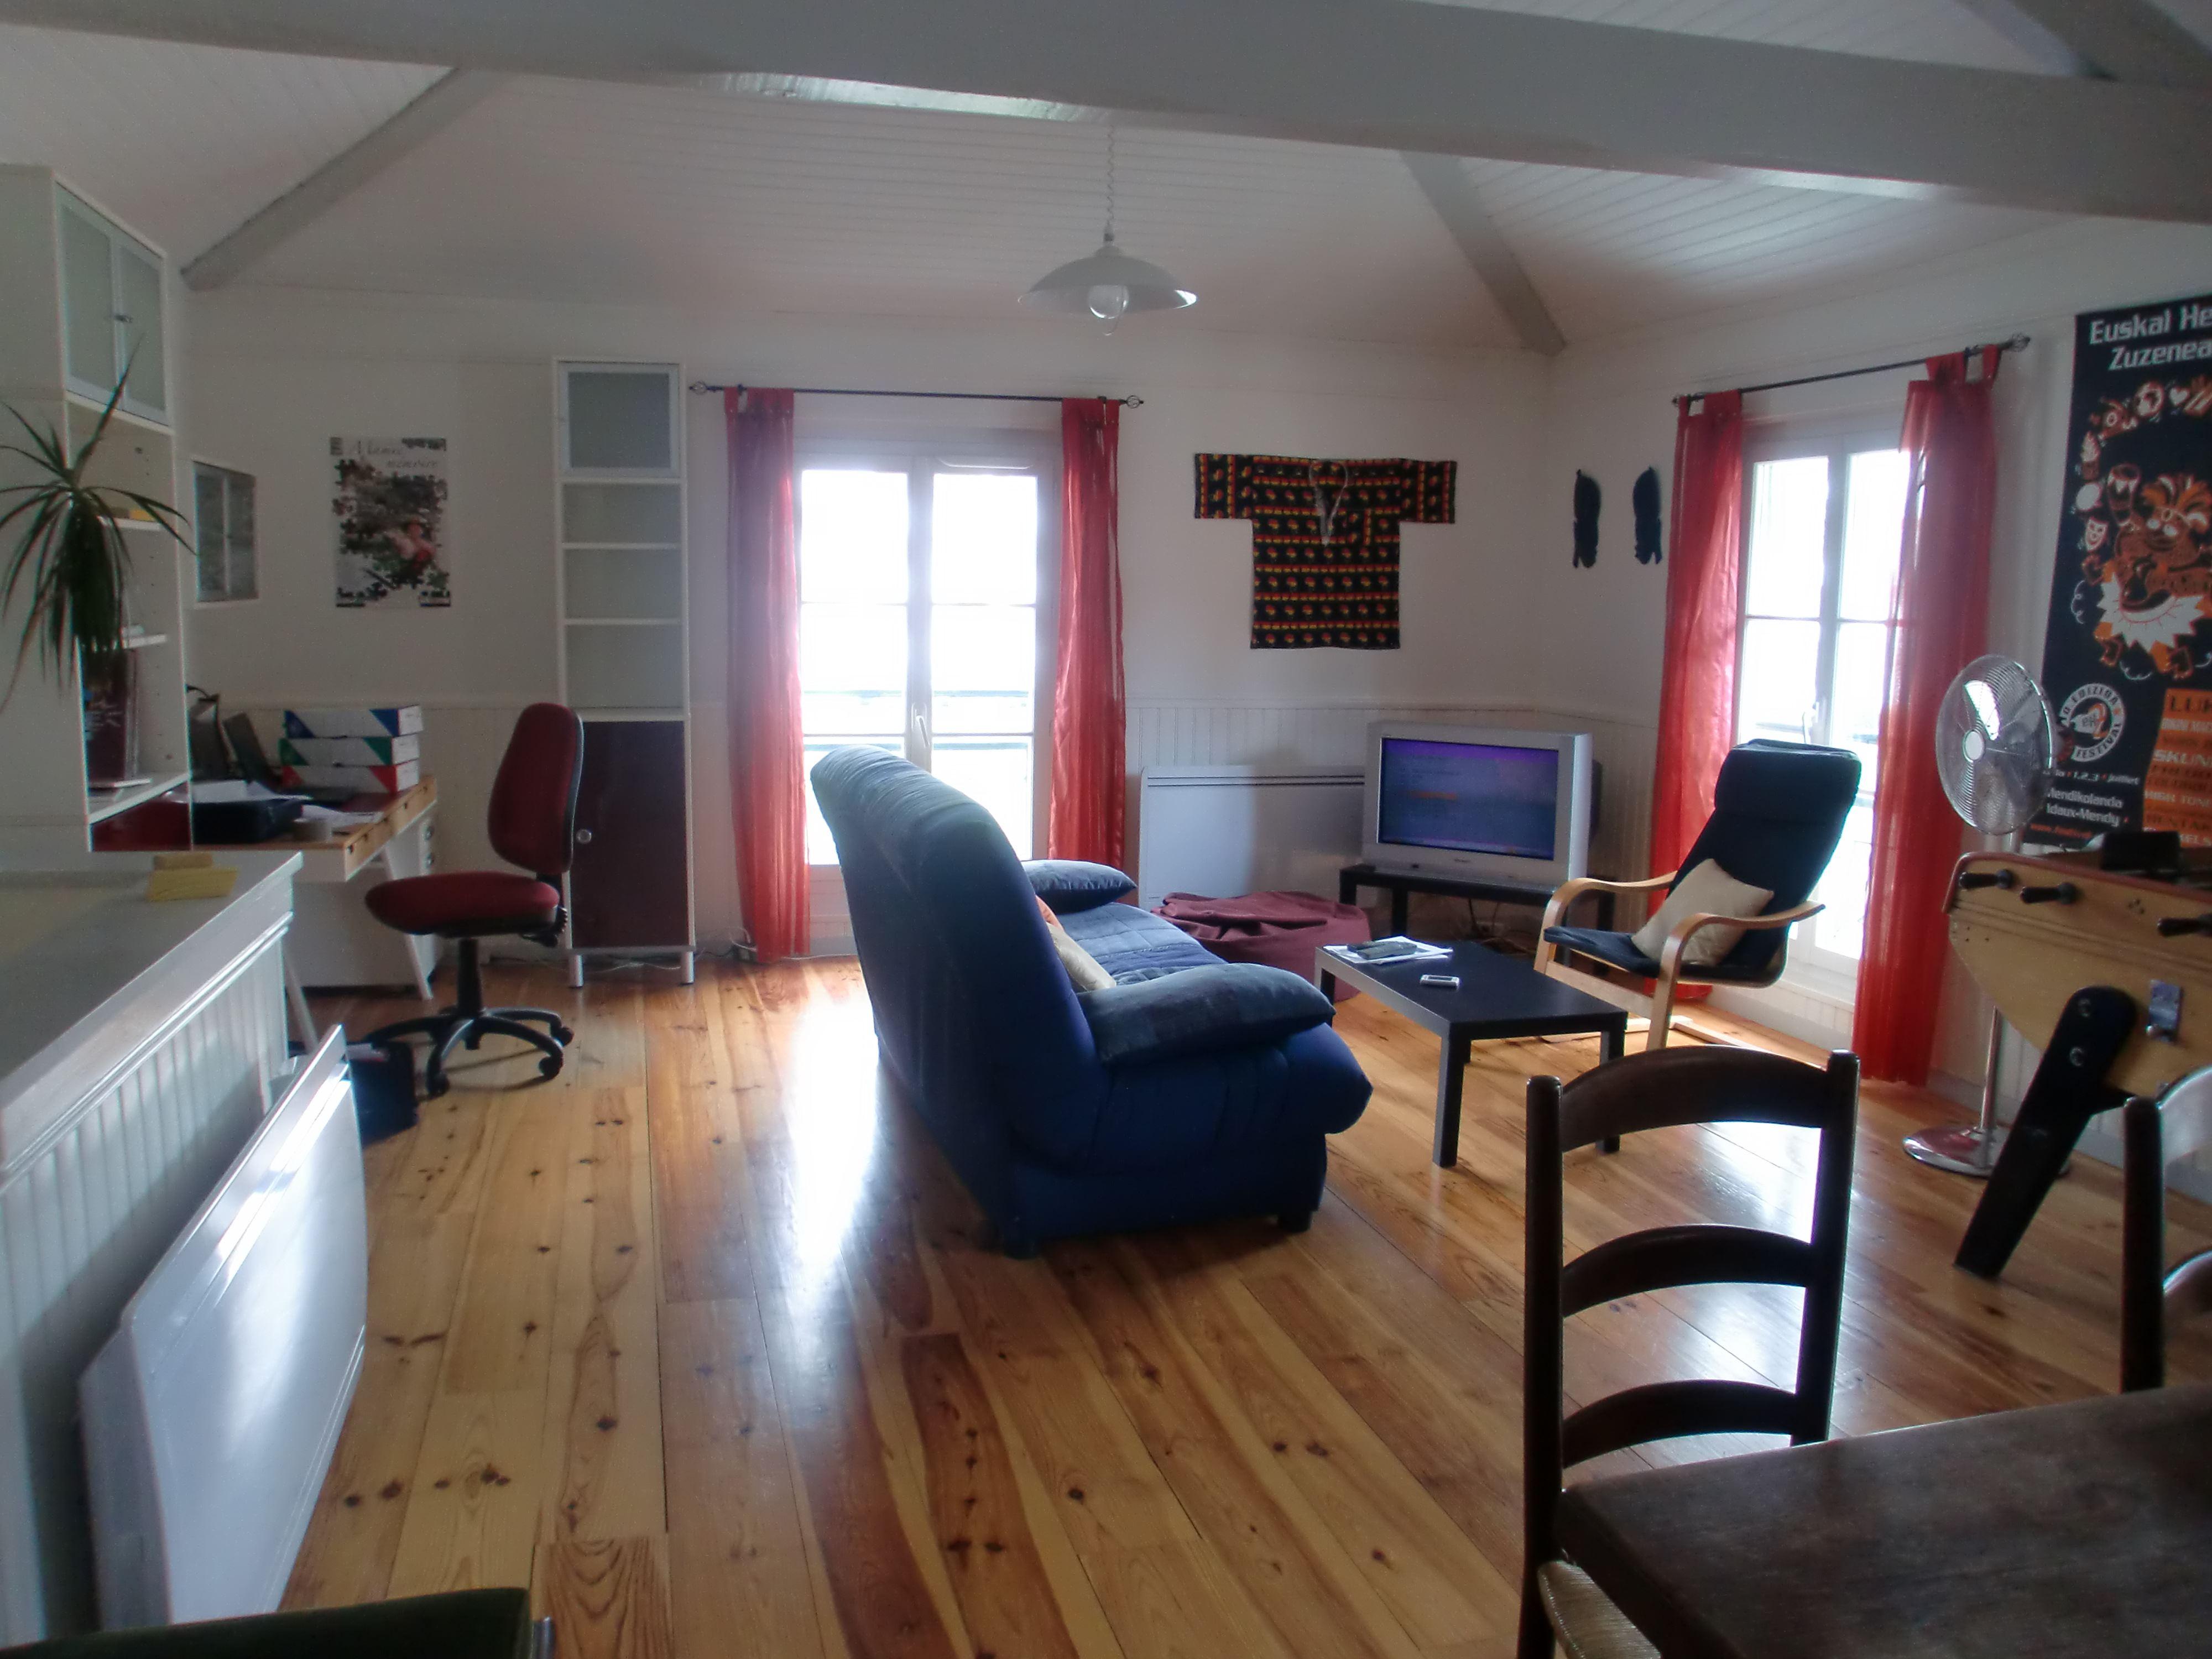 Appartement T3 de Mme Uebel